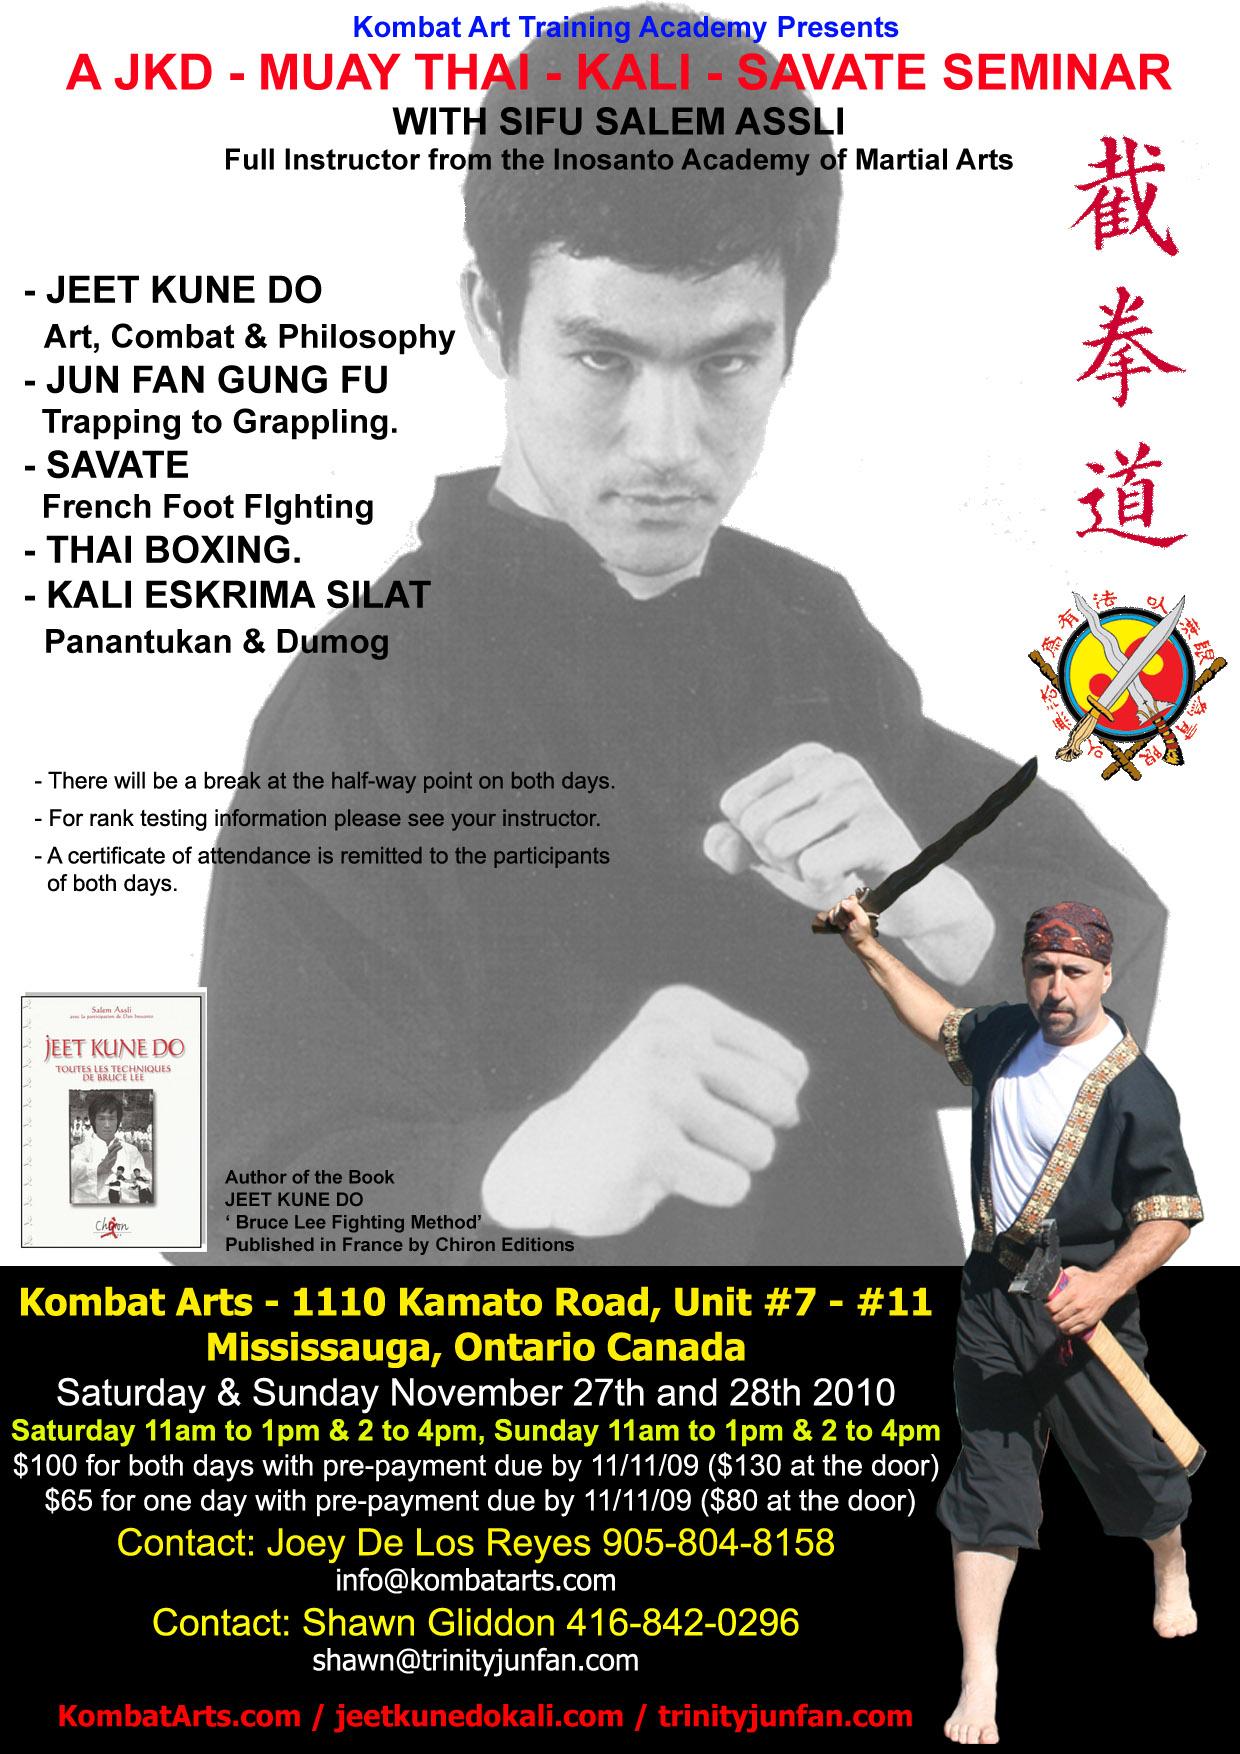 More Details On This Weekend S Salem Assli Seminar